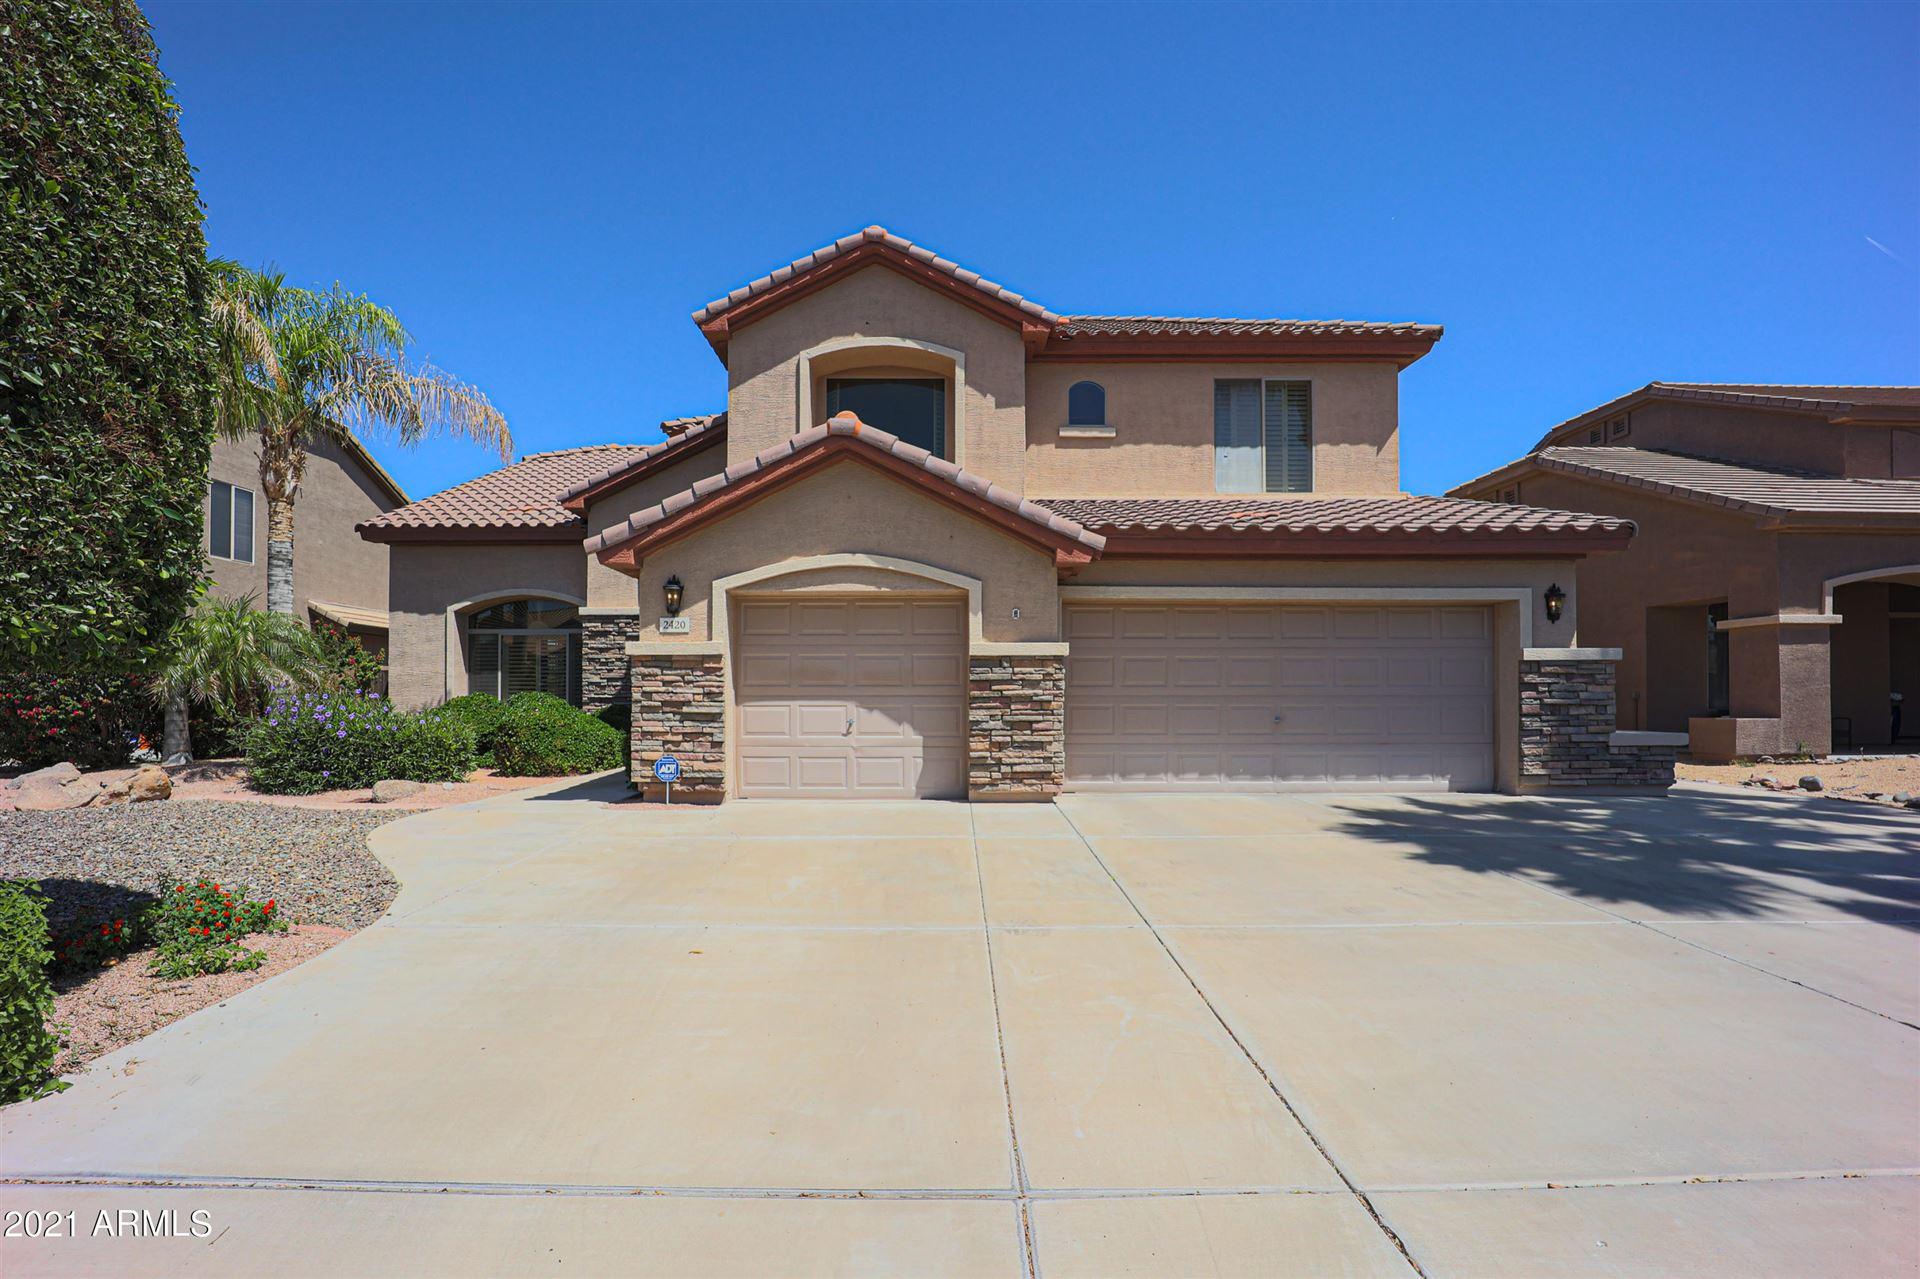 Photo of 2420 W MARLIN Drive, Chandler, AZ 85286 (MLS # 6230571)